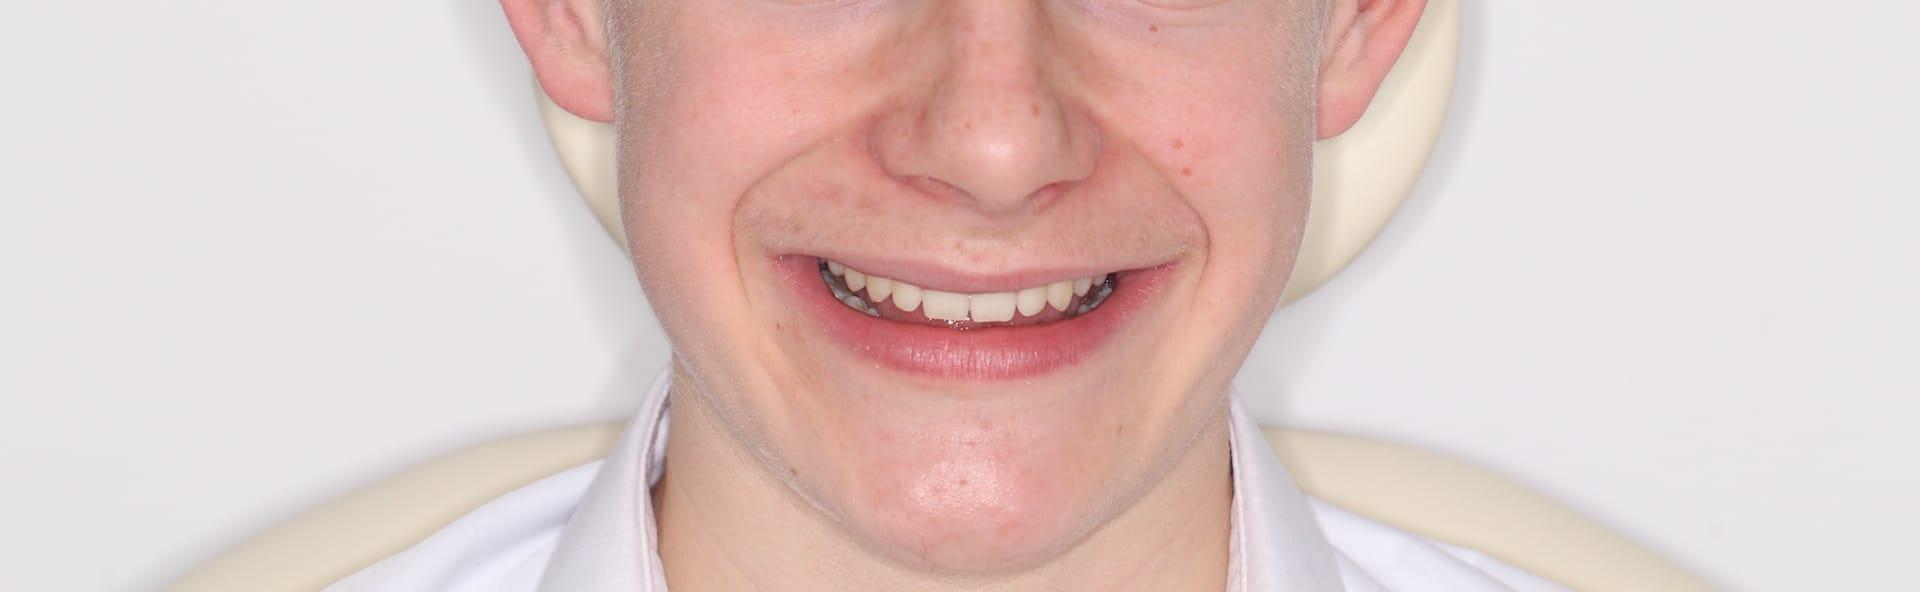 Ewan's final results from Invisalign braces